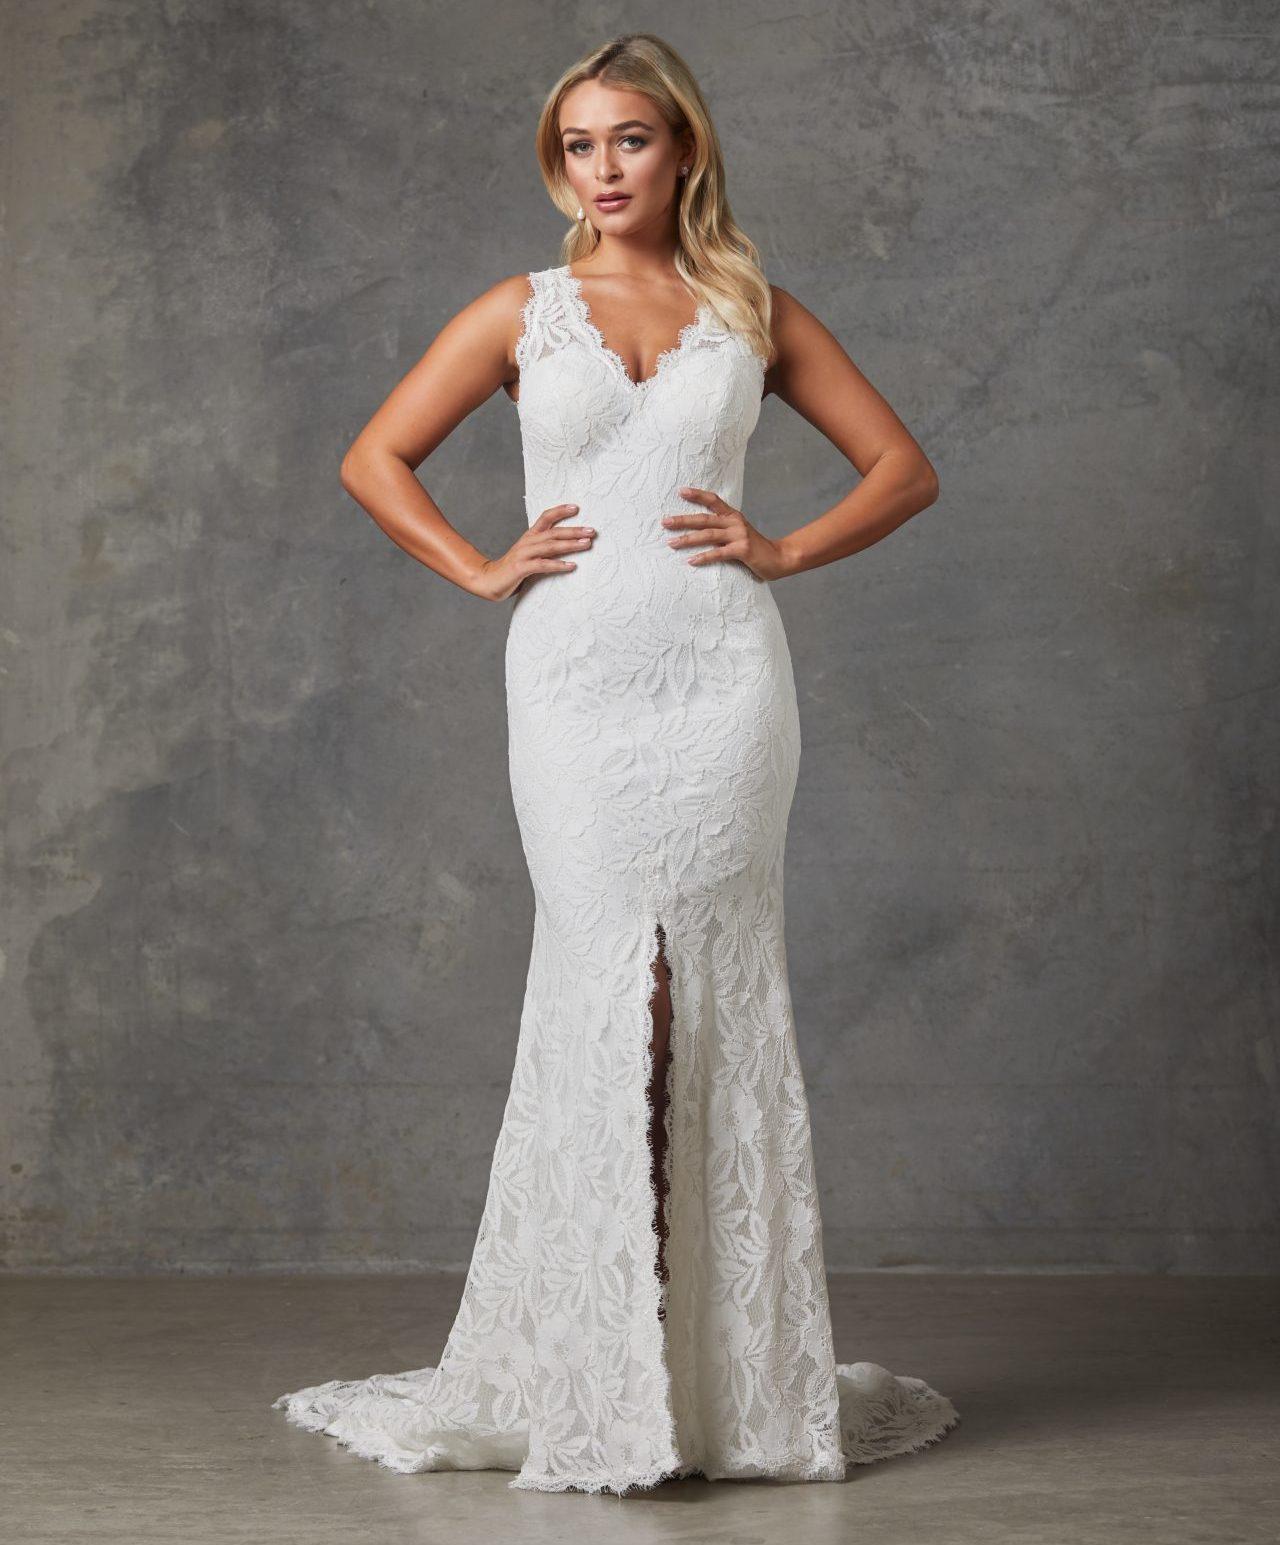 2019 Brides Collection